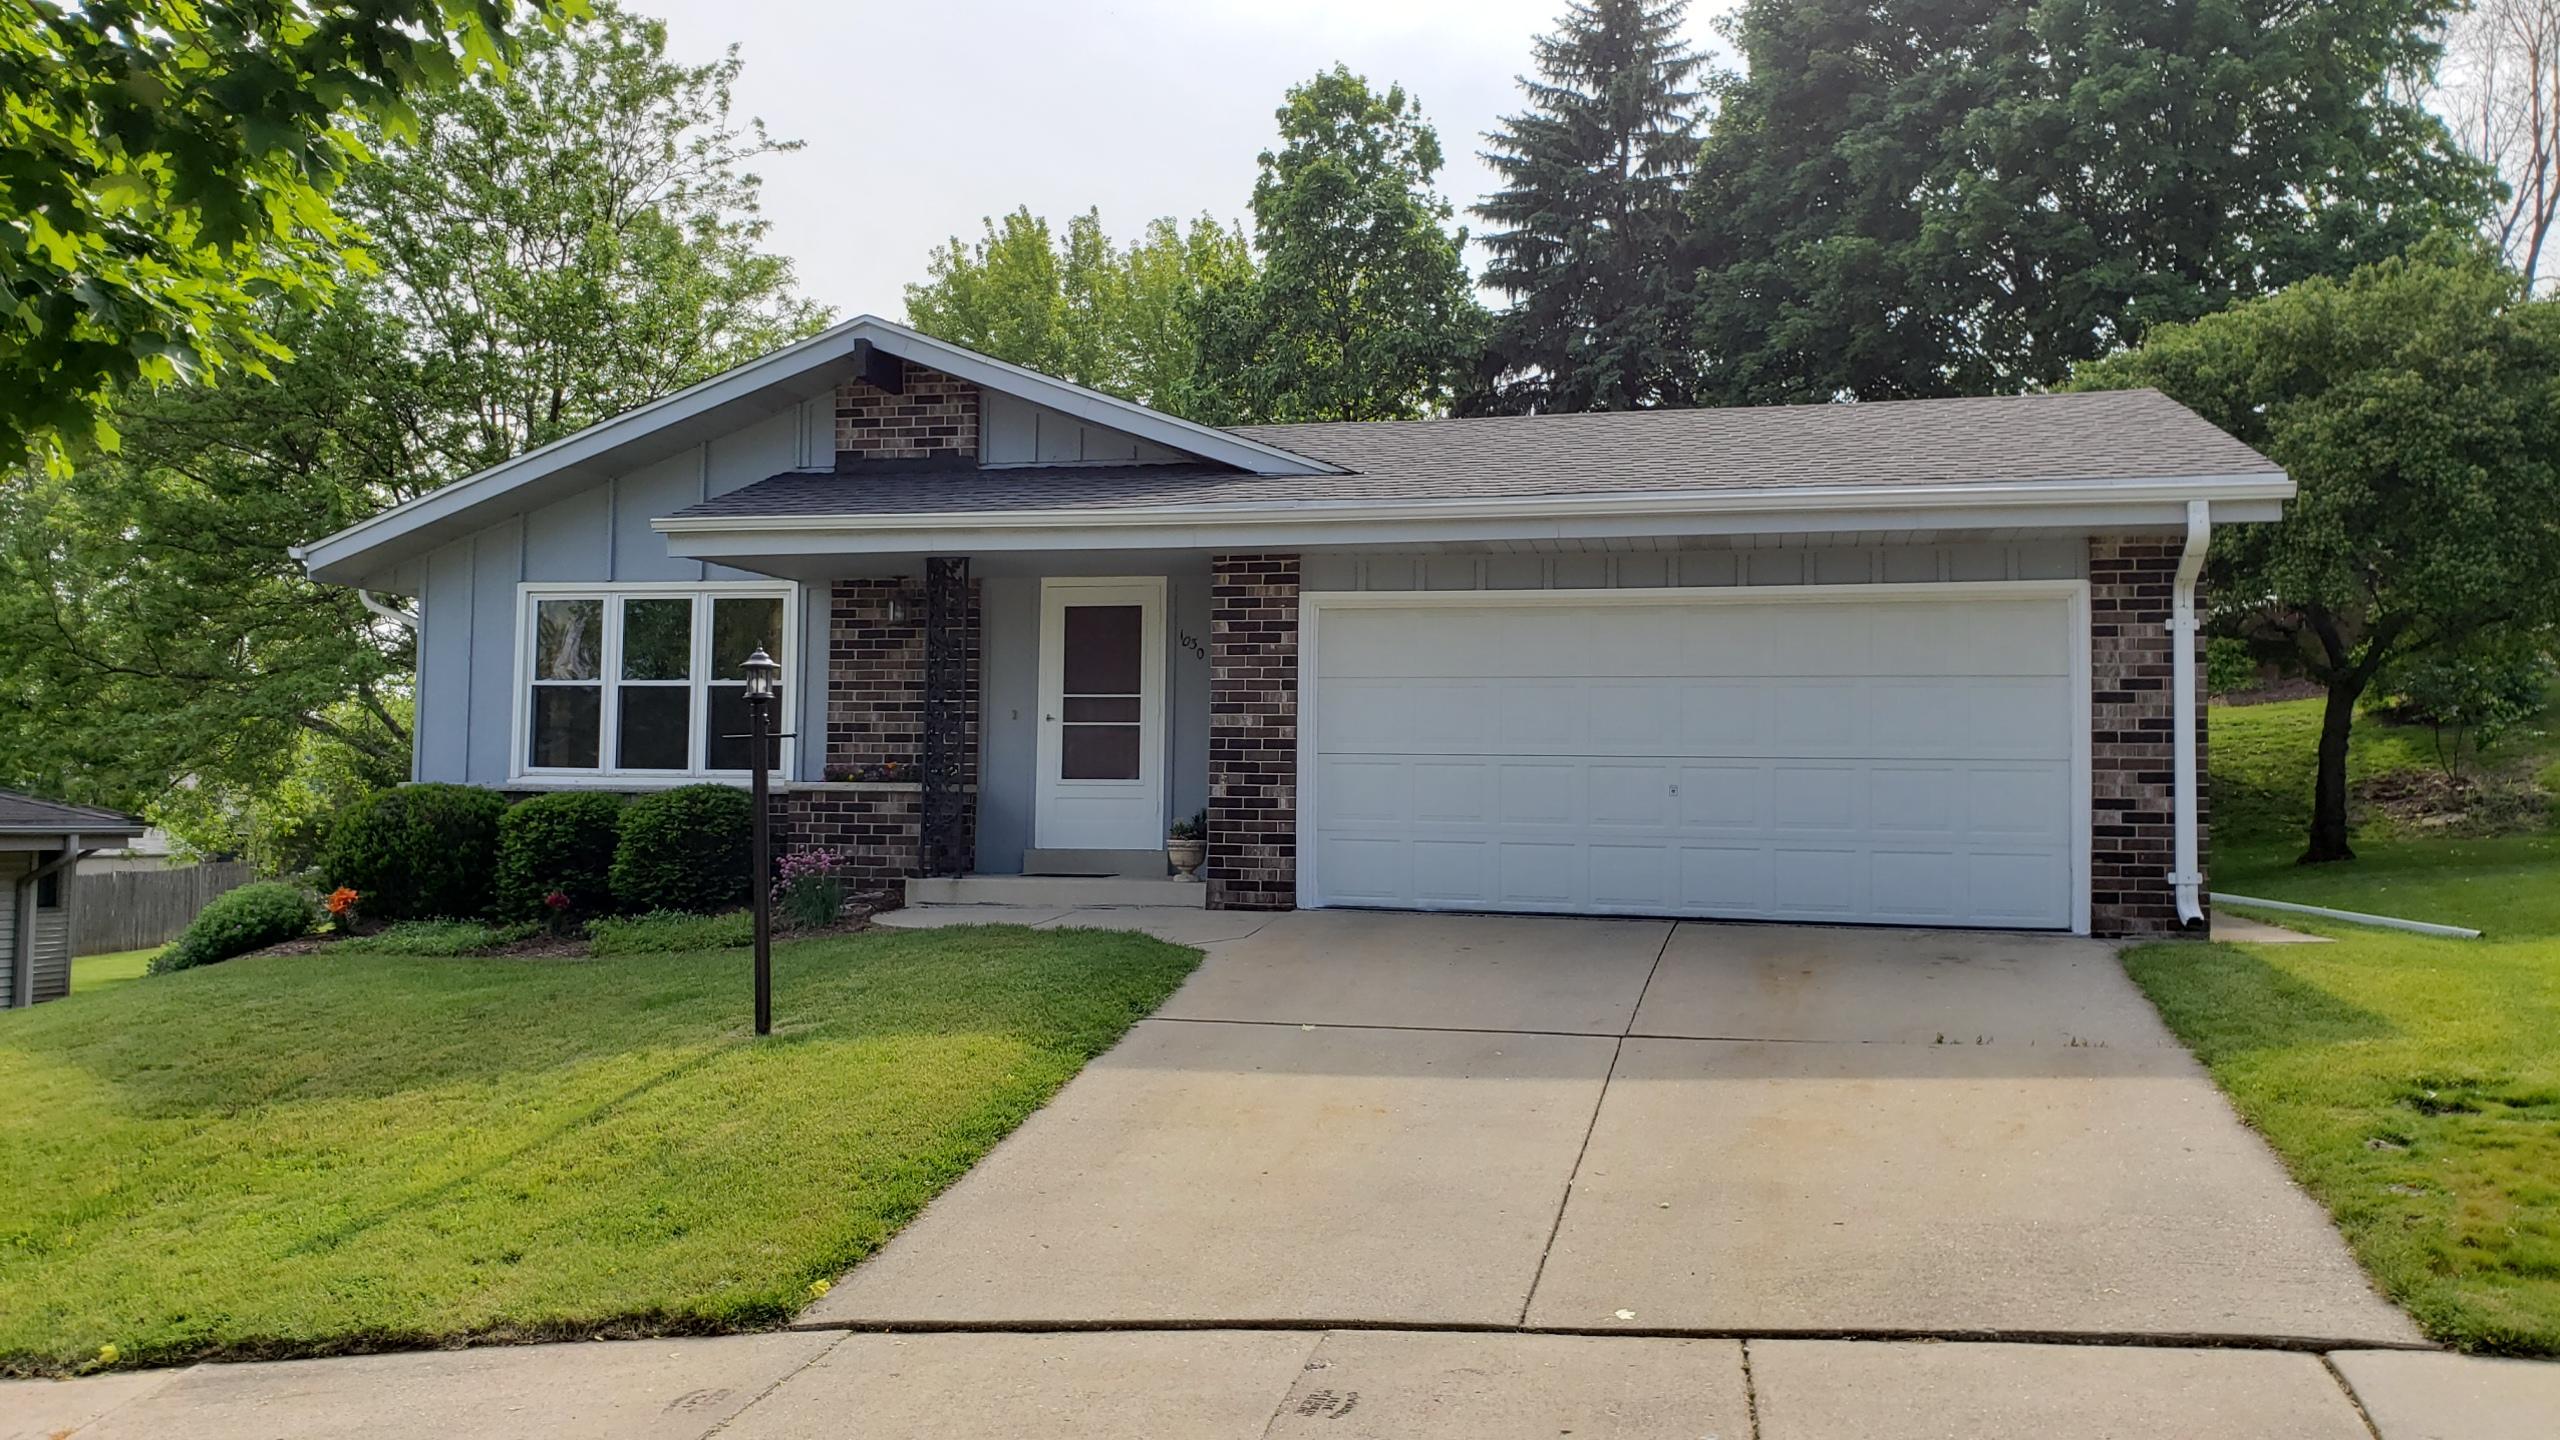 1030 Macarthur Ct, Waukesha, Wisconsin 53188, 3 Bedrooms Bedrooms, ,1 BathroomBathrooms,Single-Family,For Sale,Macarthur Ct,1641234